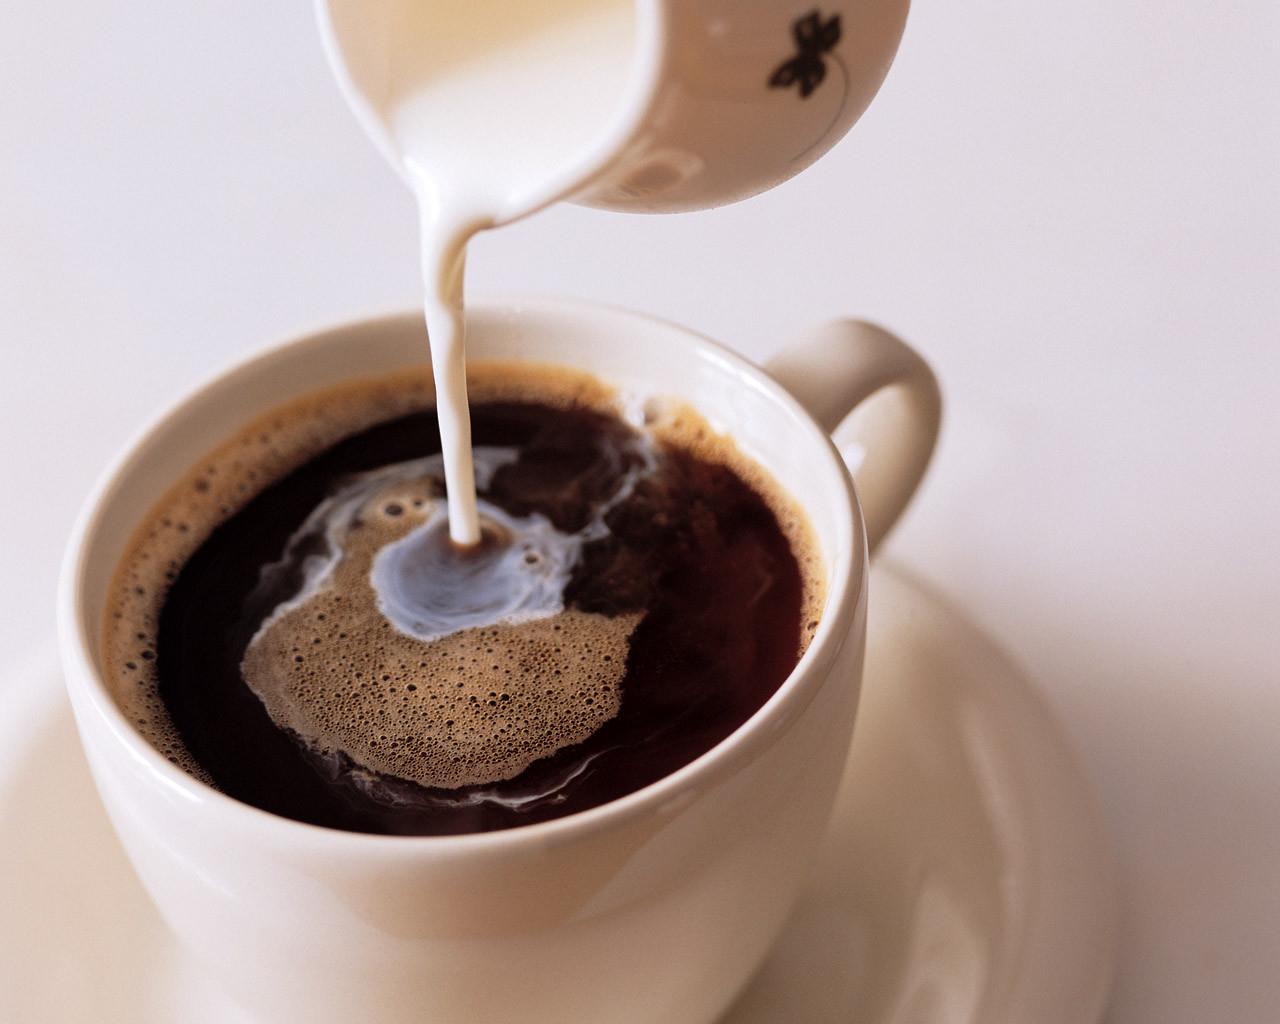 Картинки по запросу кофе с молоком кофе с молоком